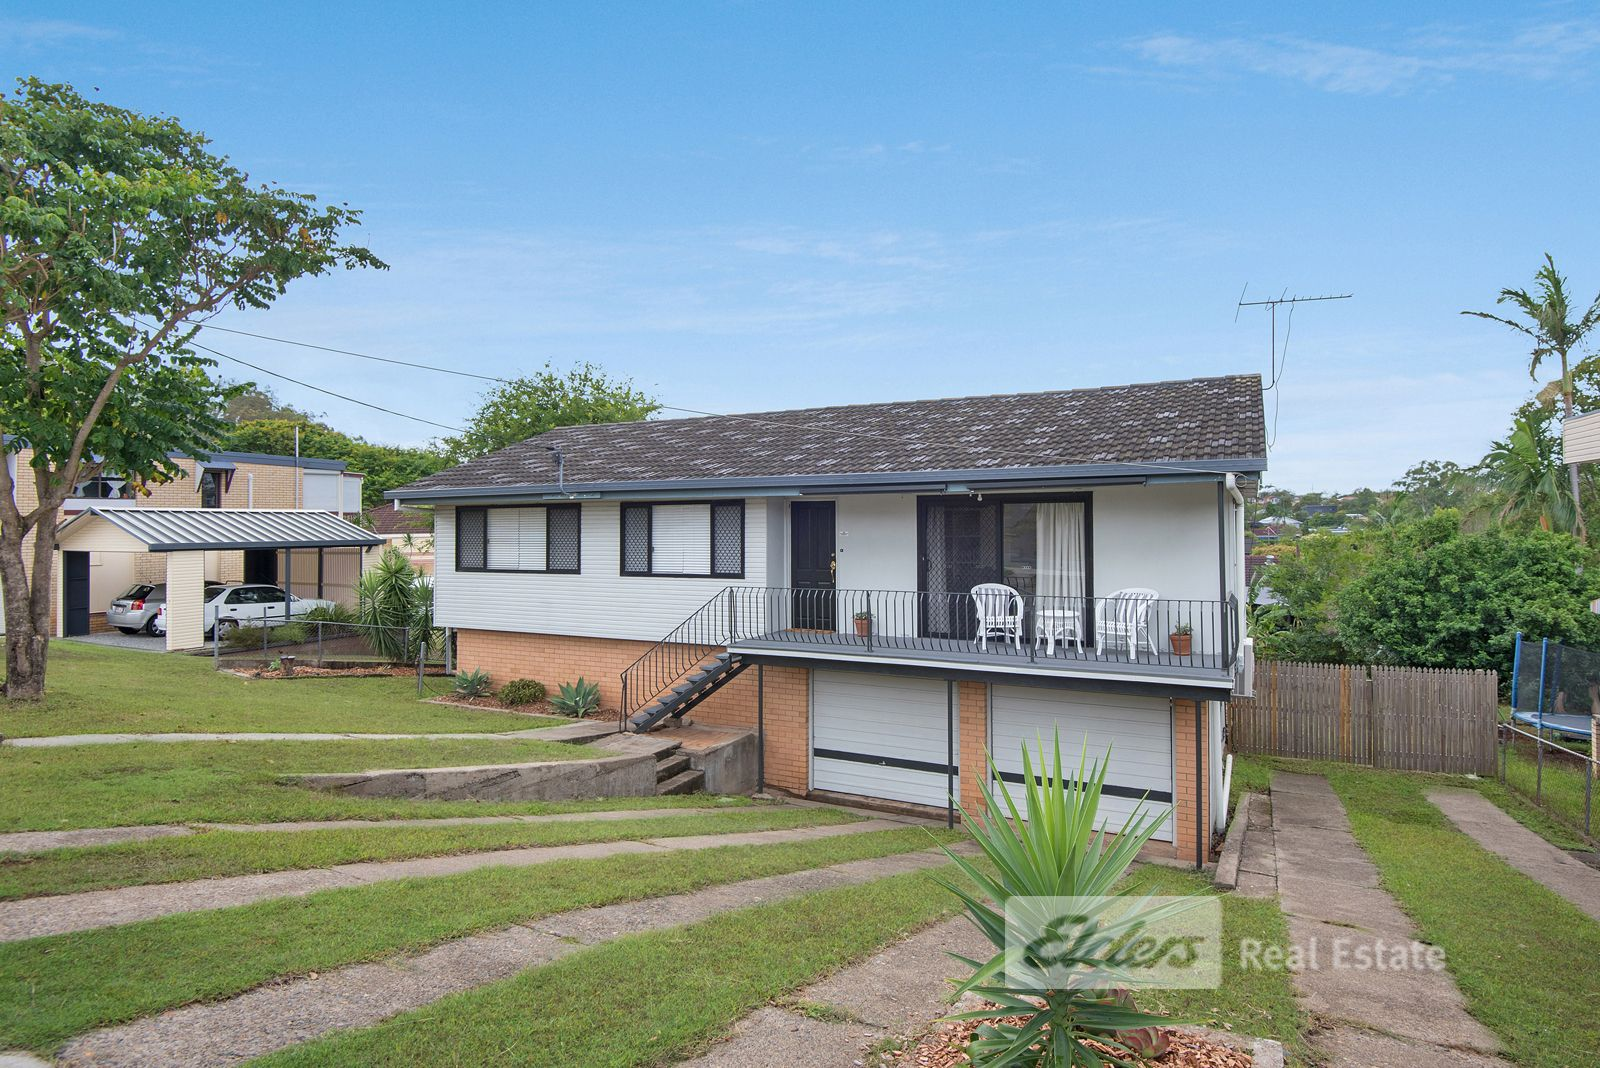 26 Hibiscus St, Everton Hills QLD 4053, Image 2